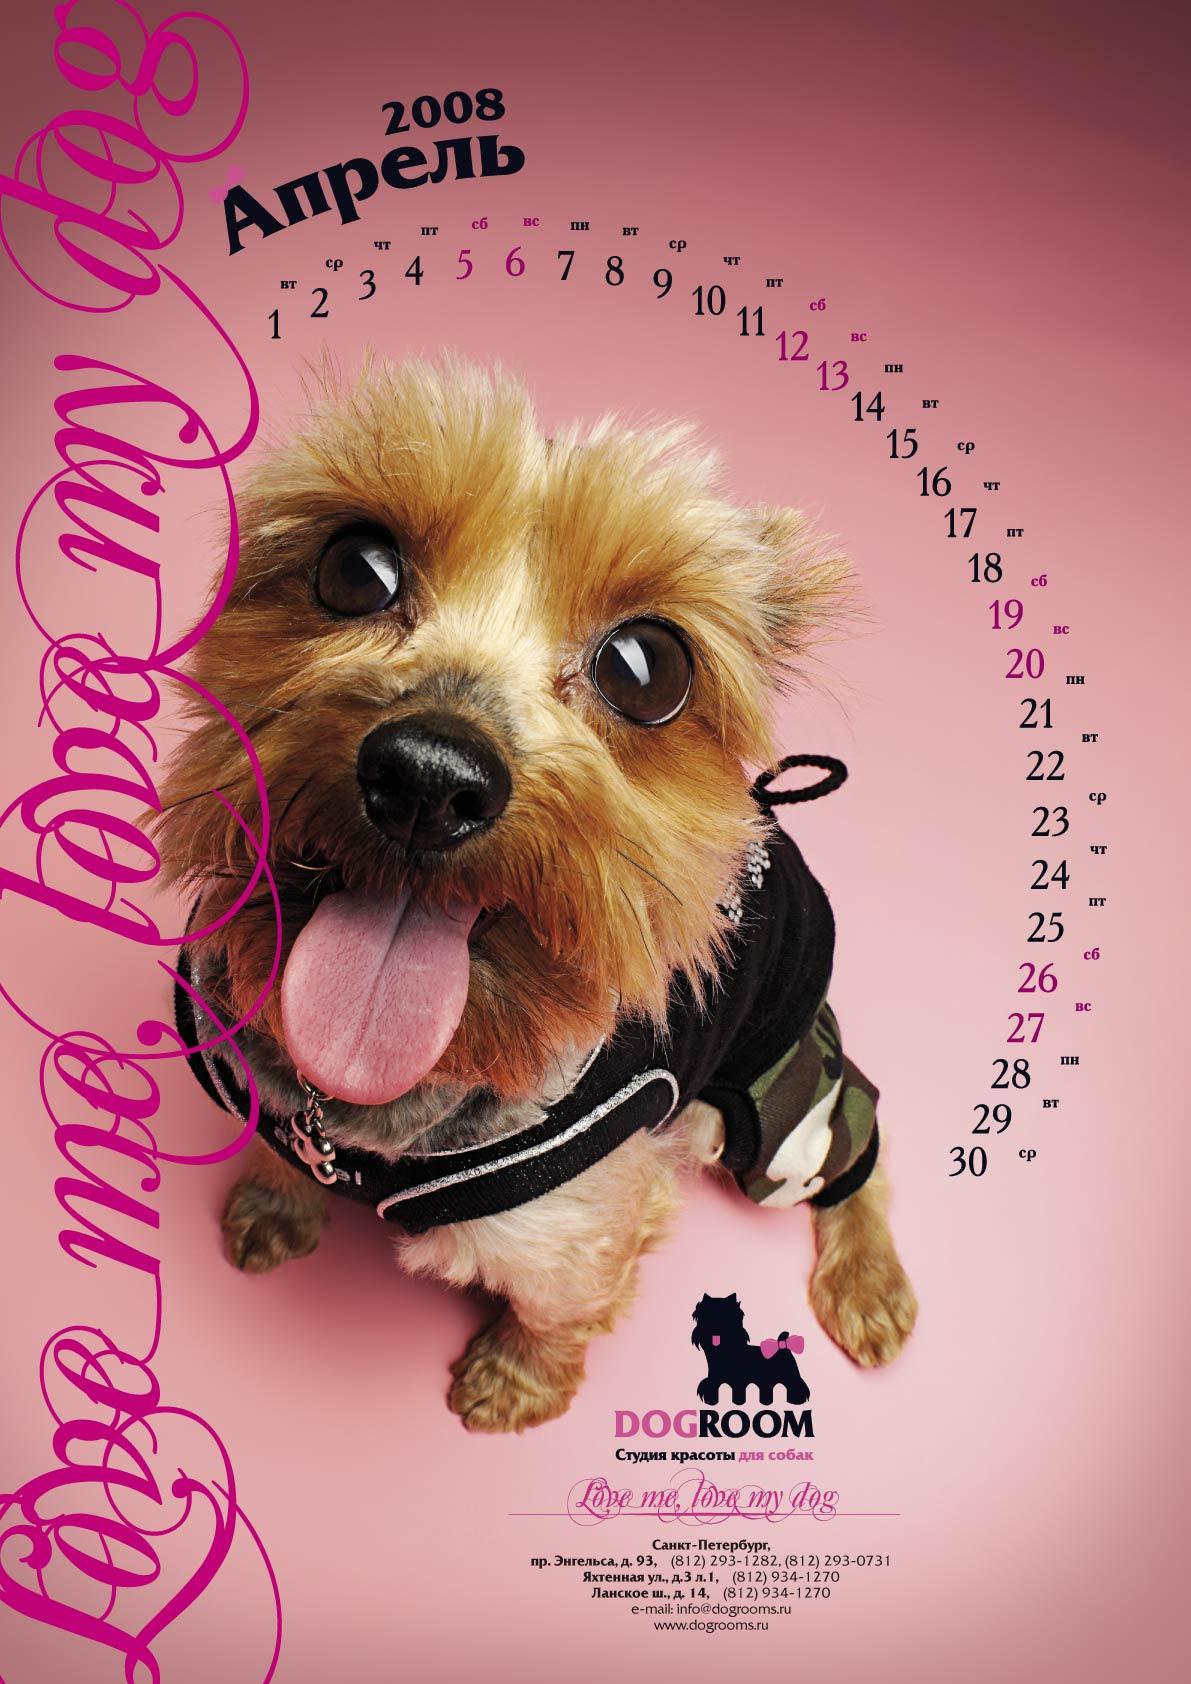 Dogroom_Calendar_04